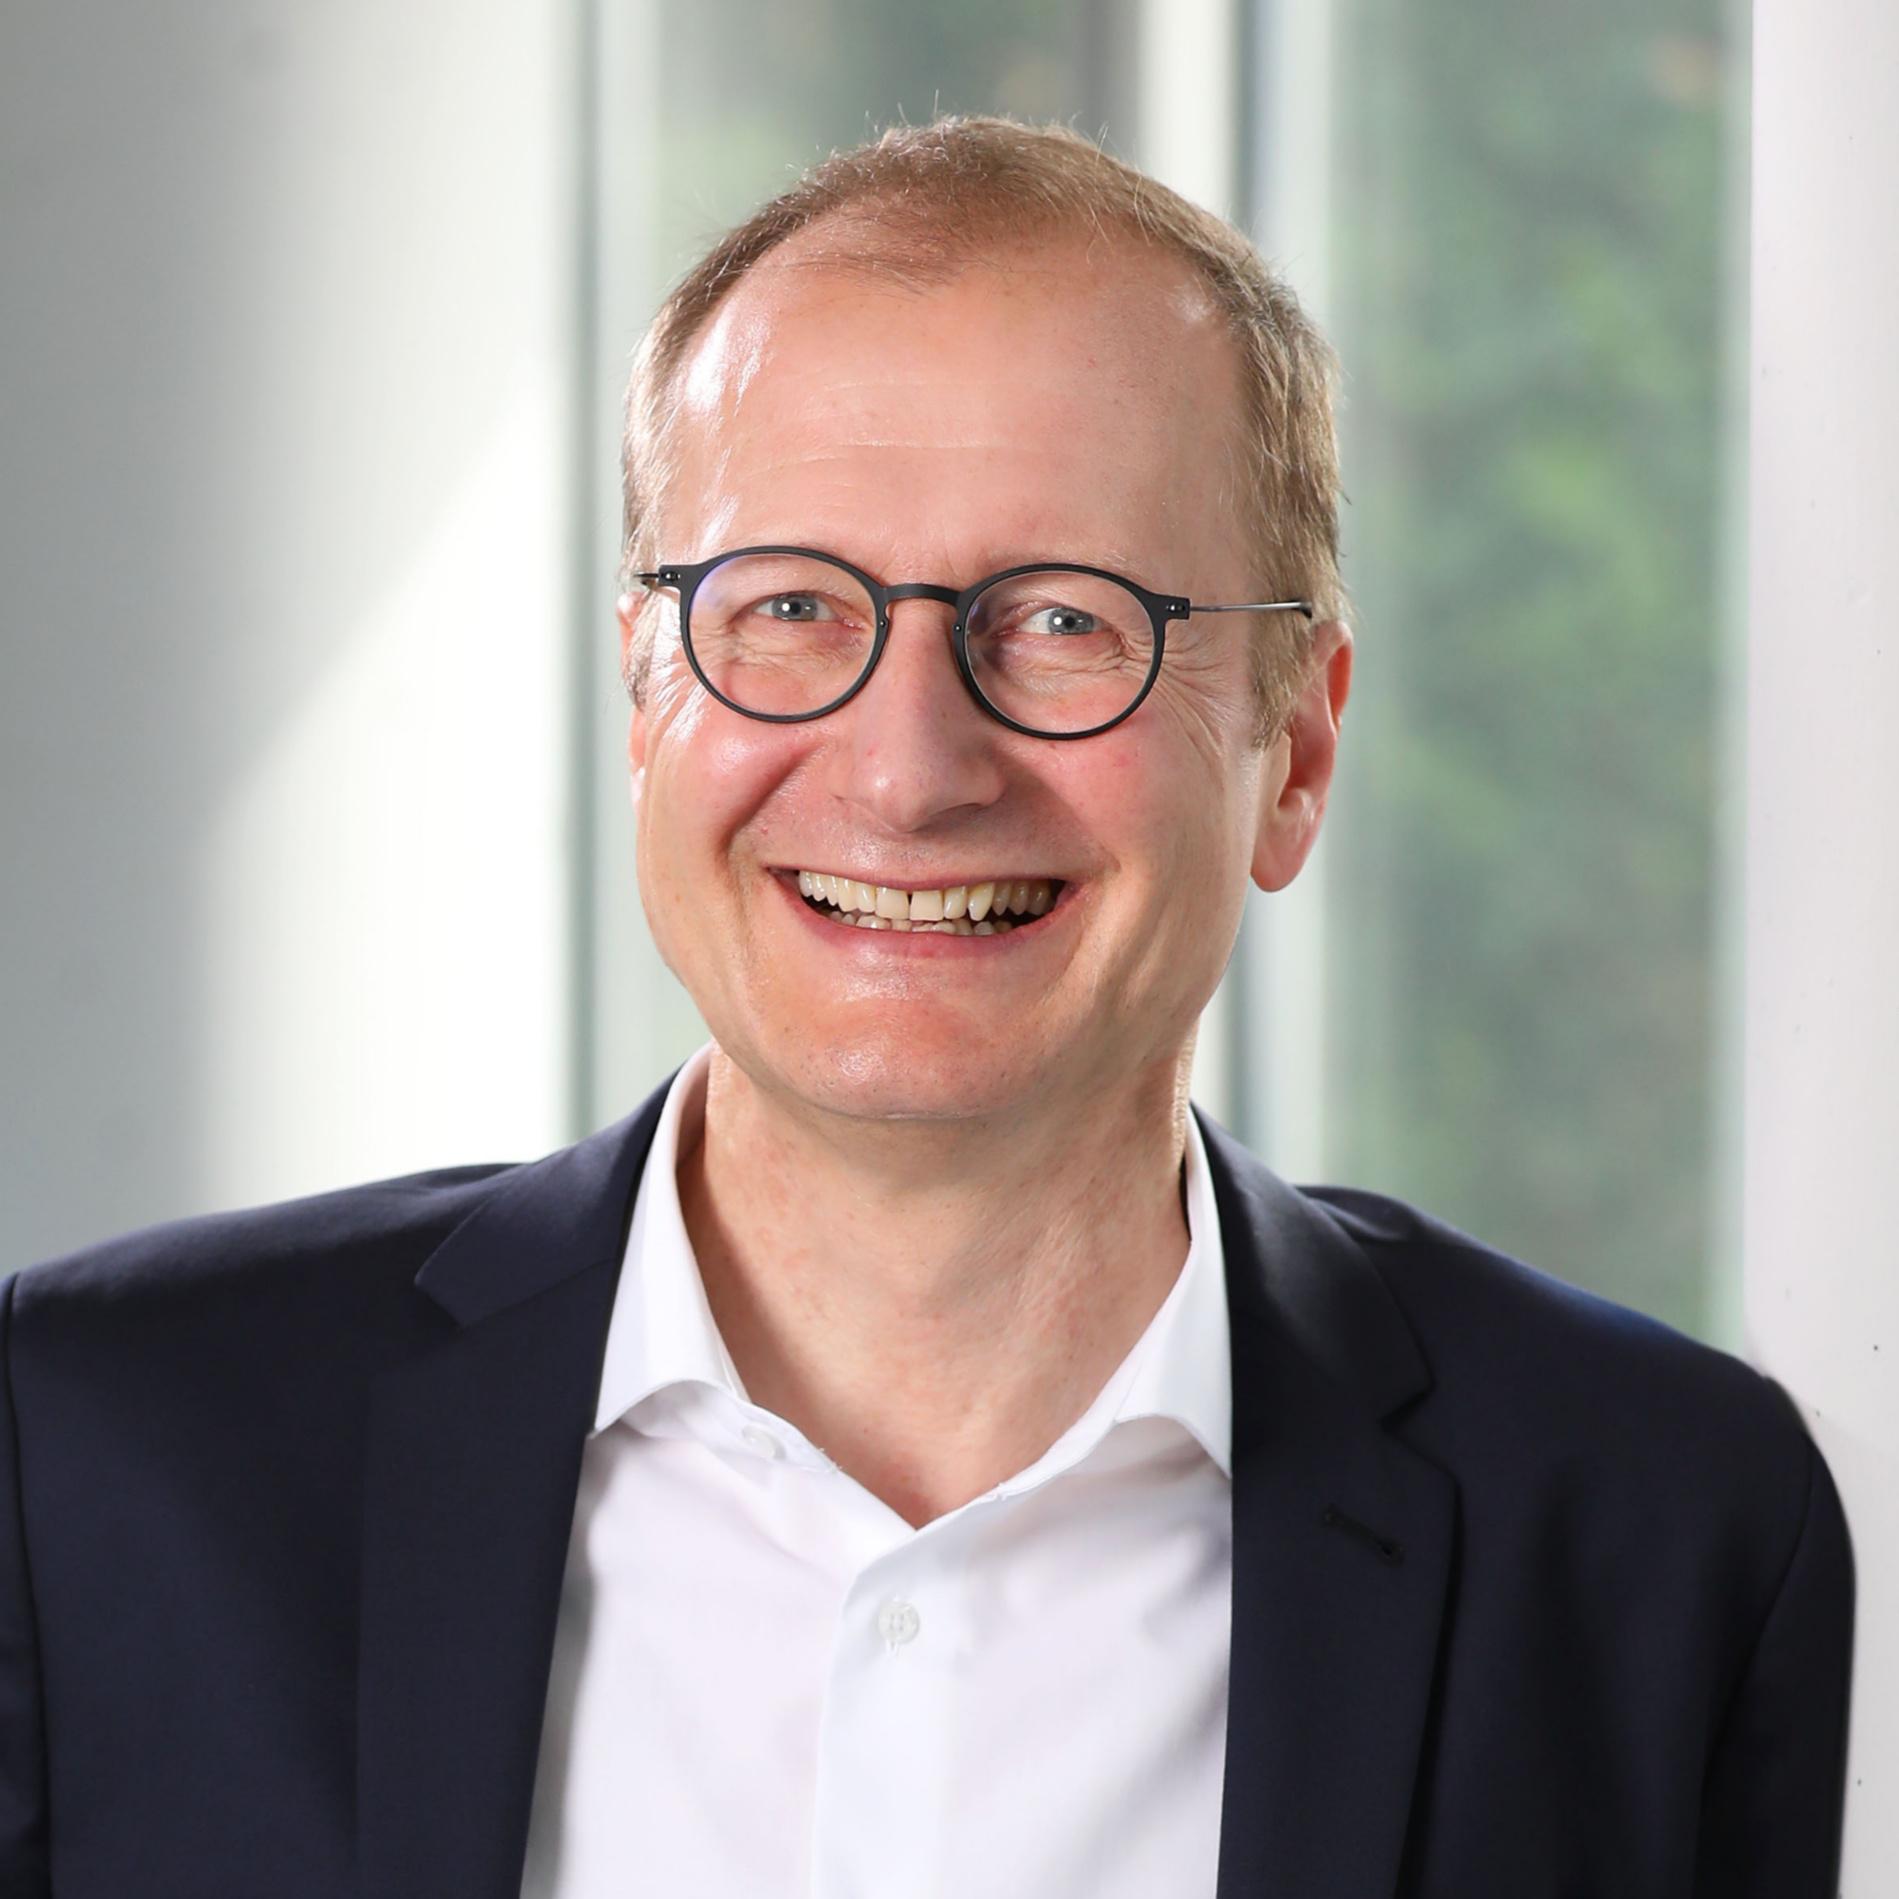 Jens Böcker